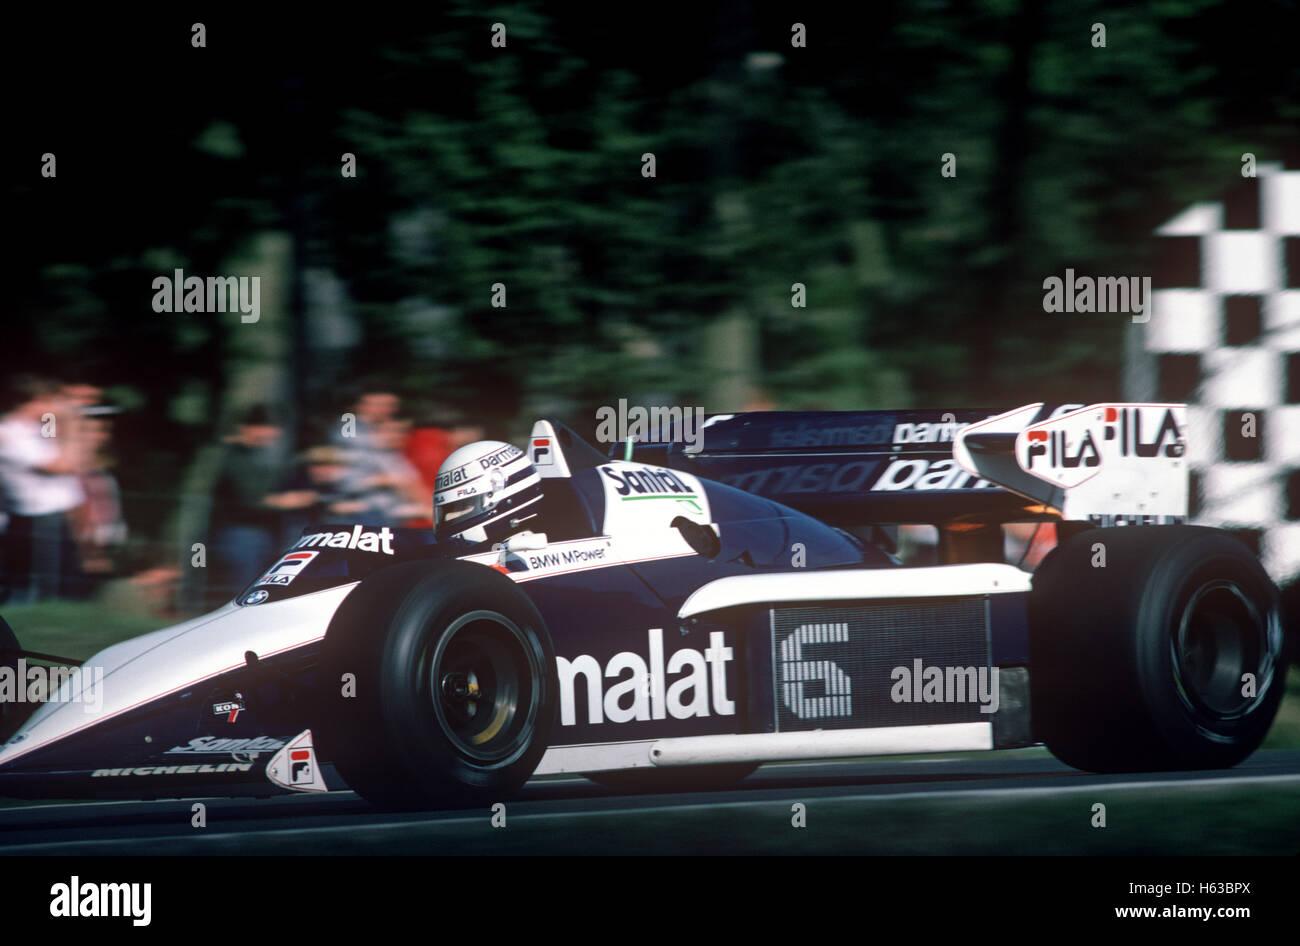 Nelson Piquet Brabham bT52 de la British GP Brands Hatch 1983 Race of Champions Photo Stock